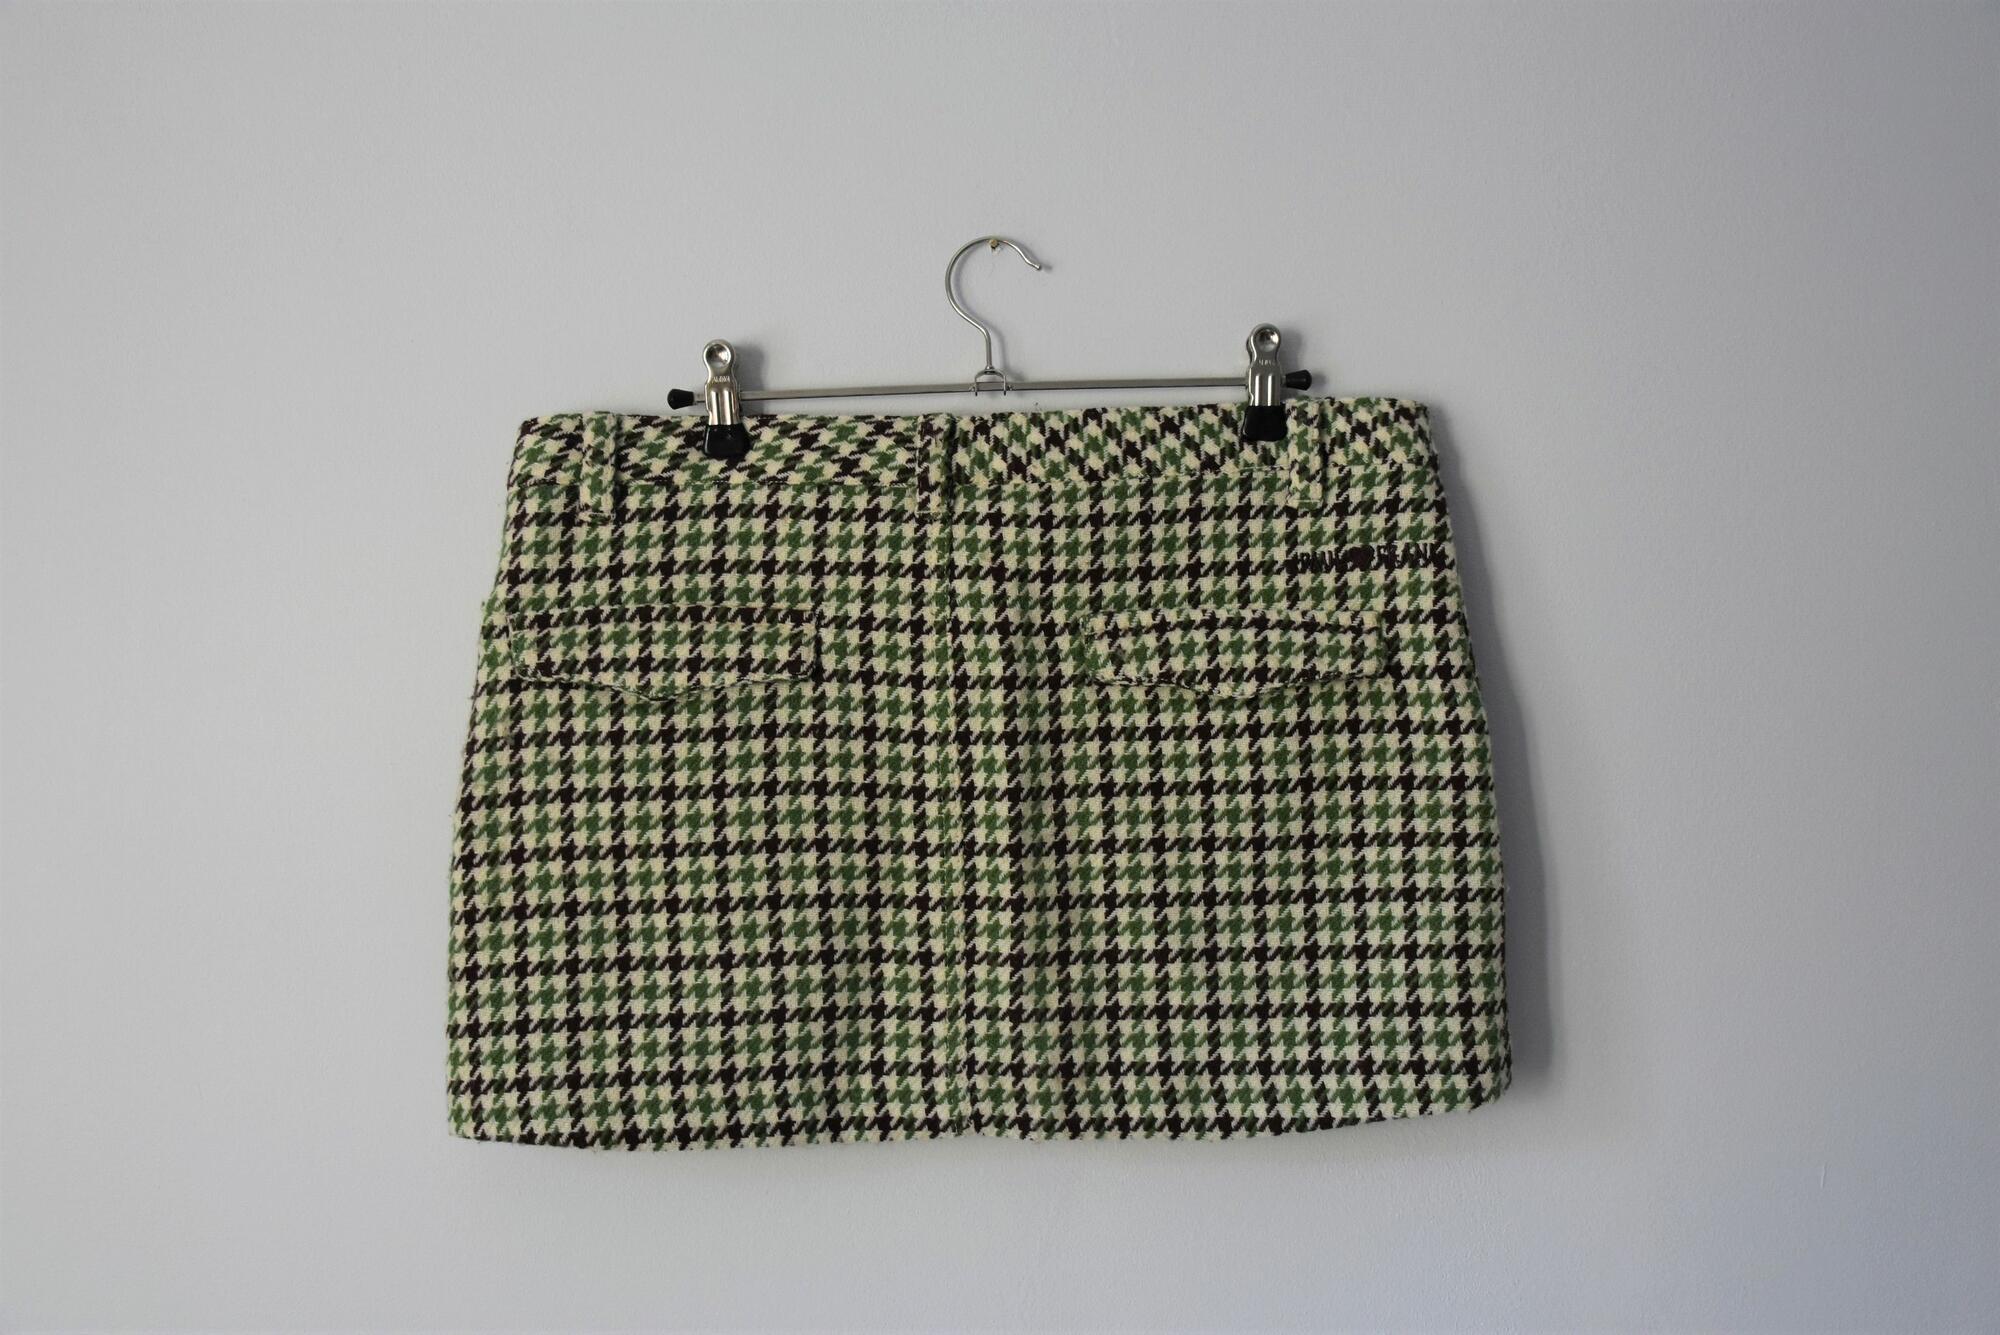 Spódnica mini lata - PONOŚ SE vintage shop | JestemSlow.pl